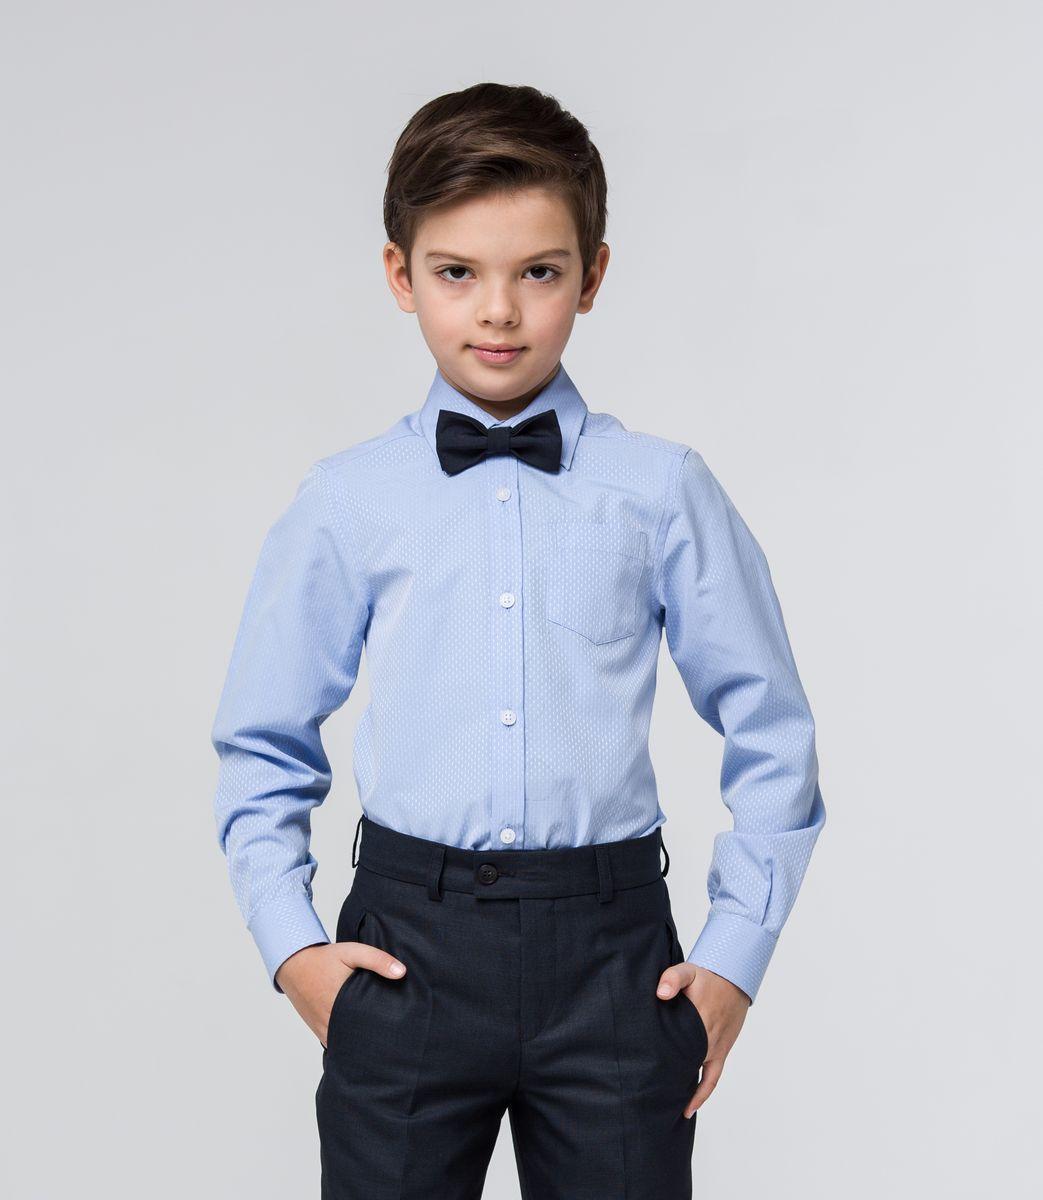 Рубашка для мальчика. SSFSB-629-13830-319SSFSB-629-13830-319